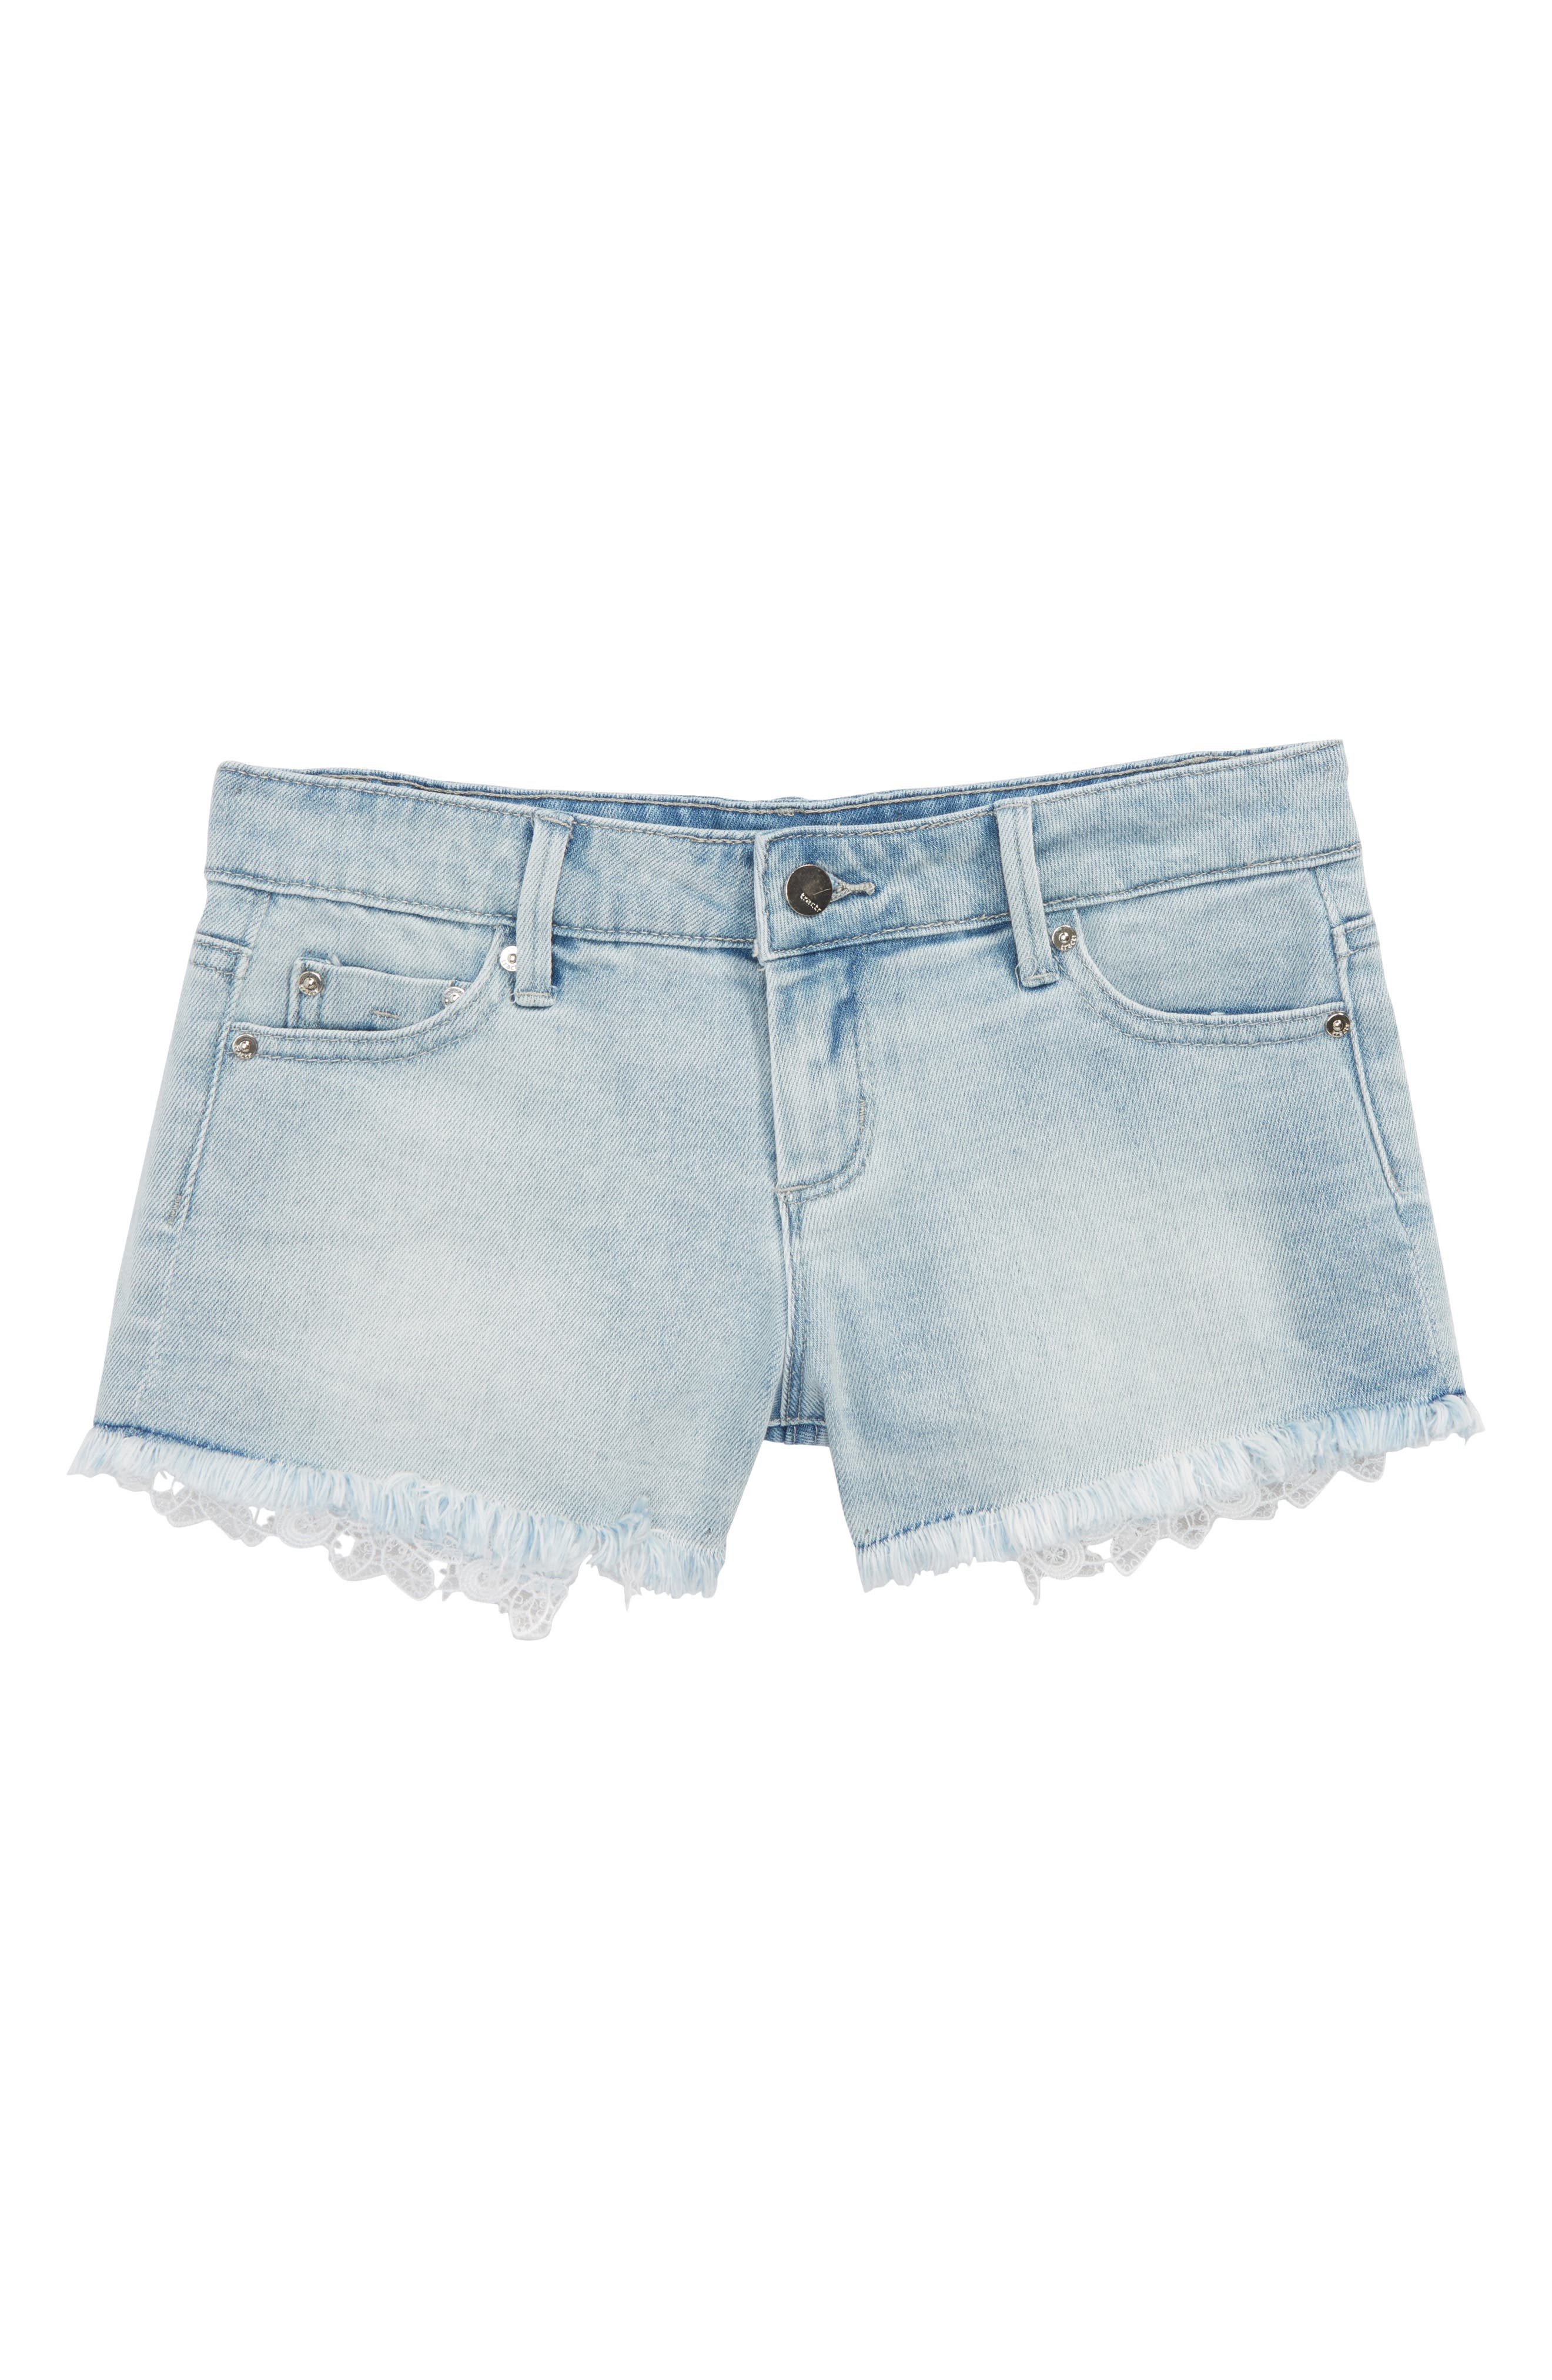 Lace Denim Shorts,                             Main thumbnail 1, color,                             400